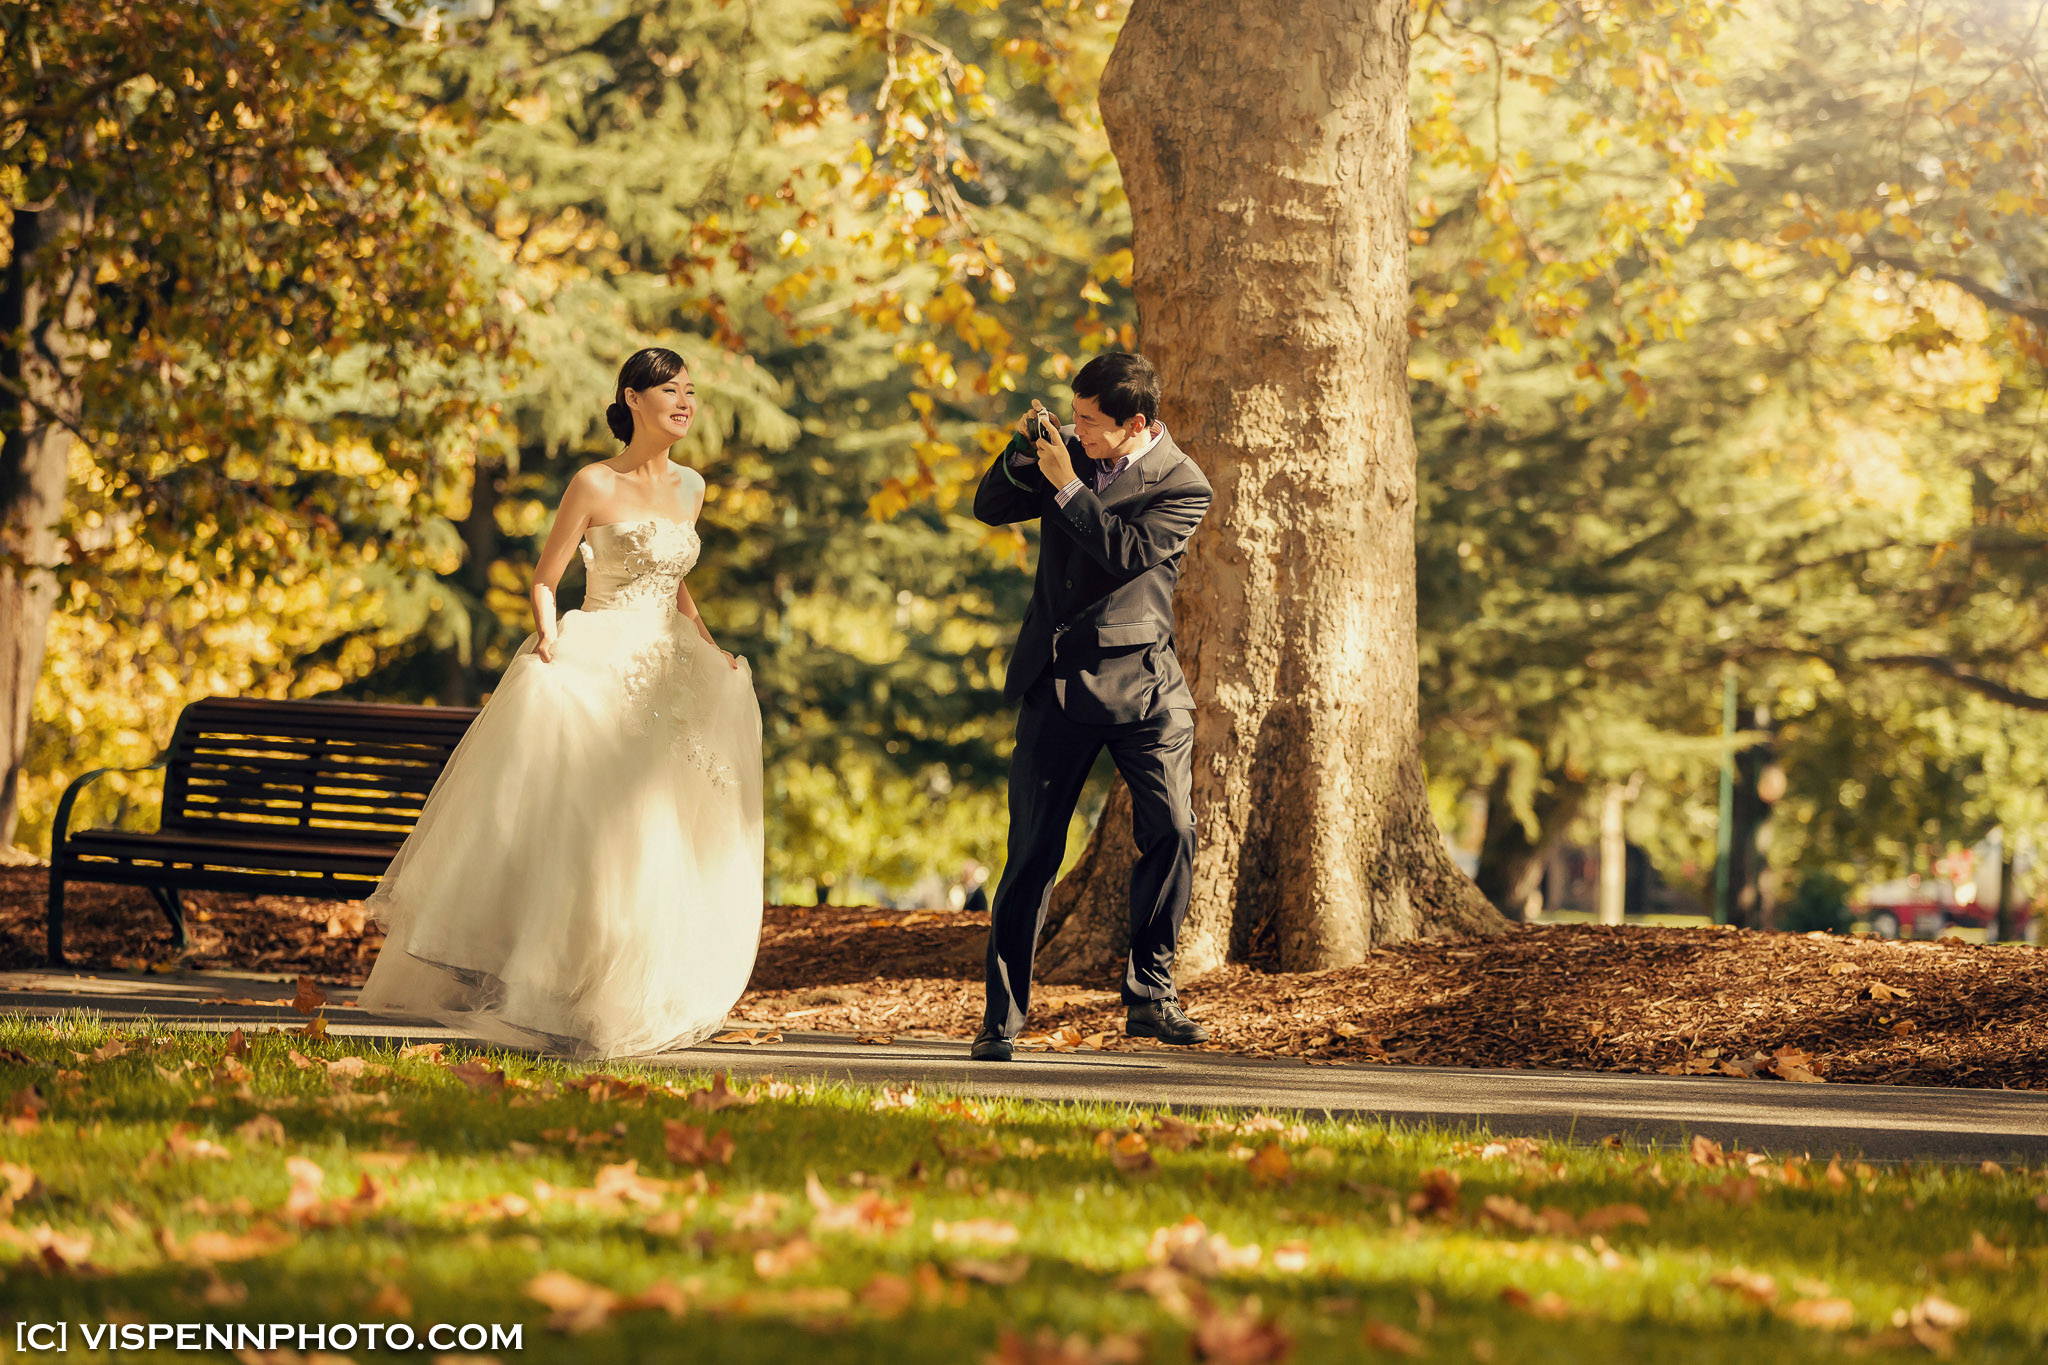 PRE WEDDING Photography Melbourne VISPENN 墨尔本 婚纱照 结婚照 婚纱摄影 FrankHu 0323